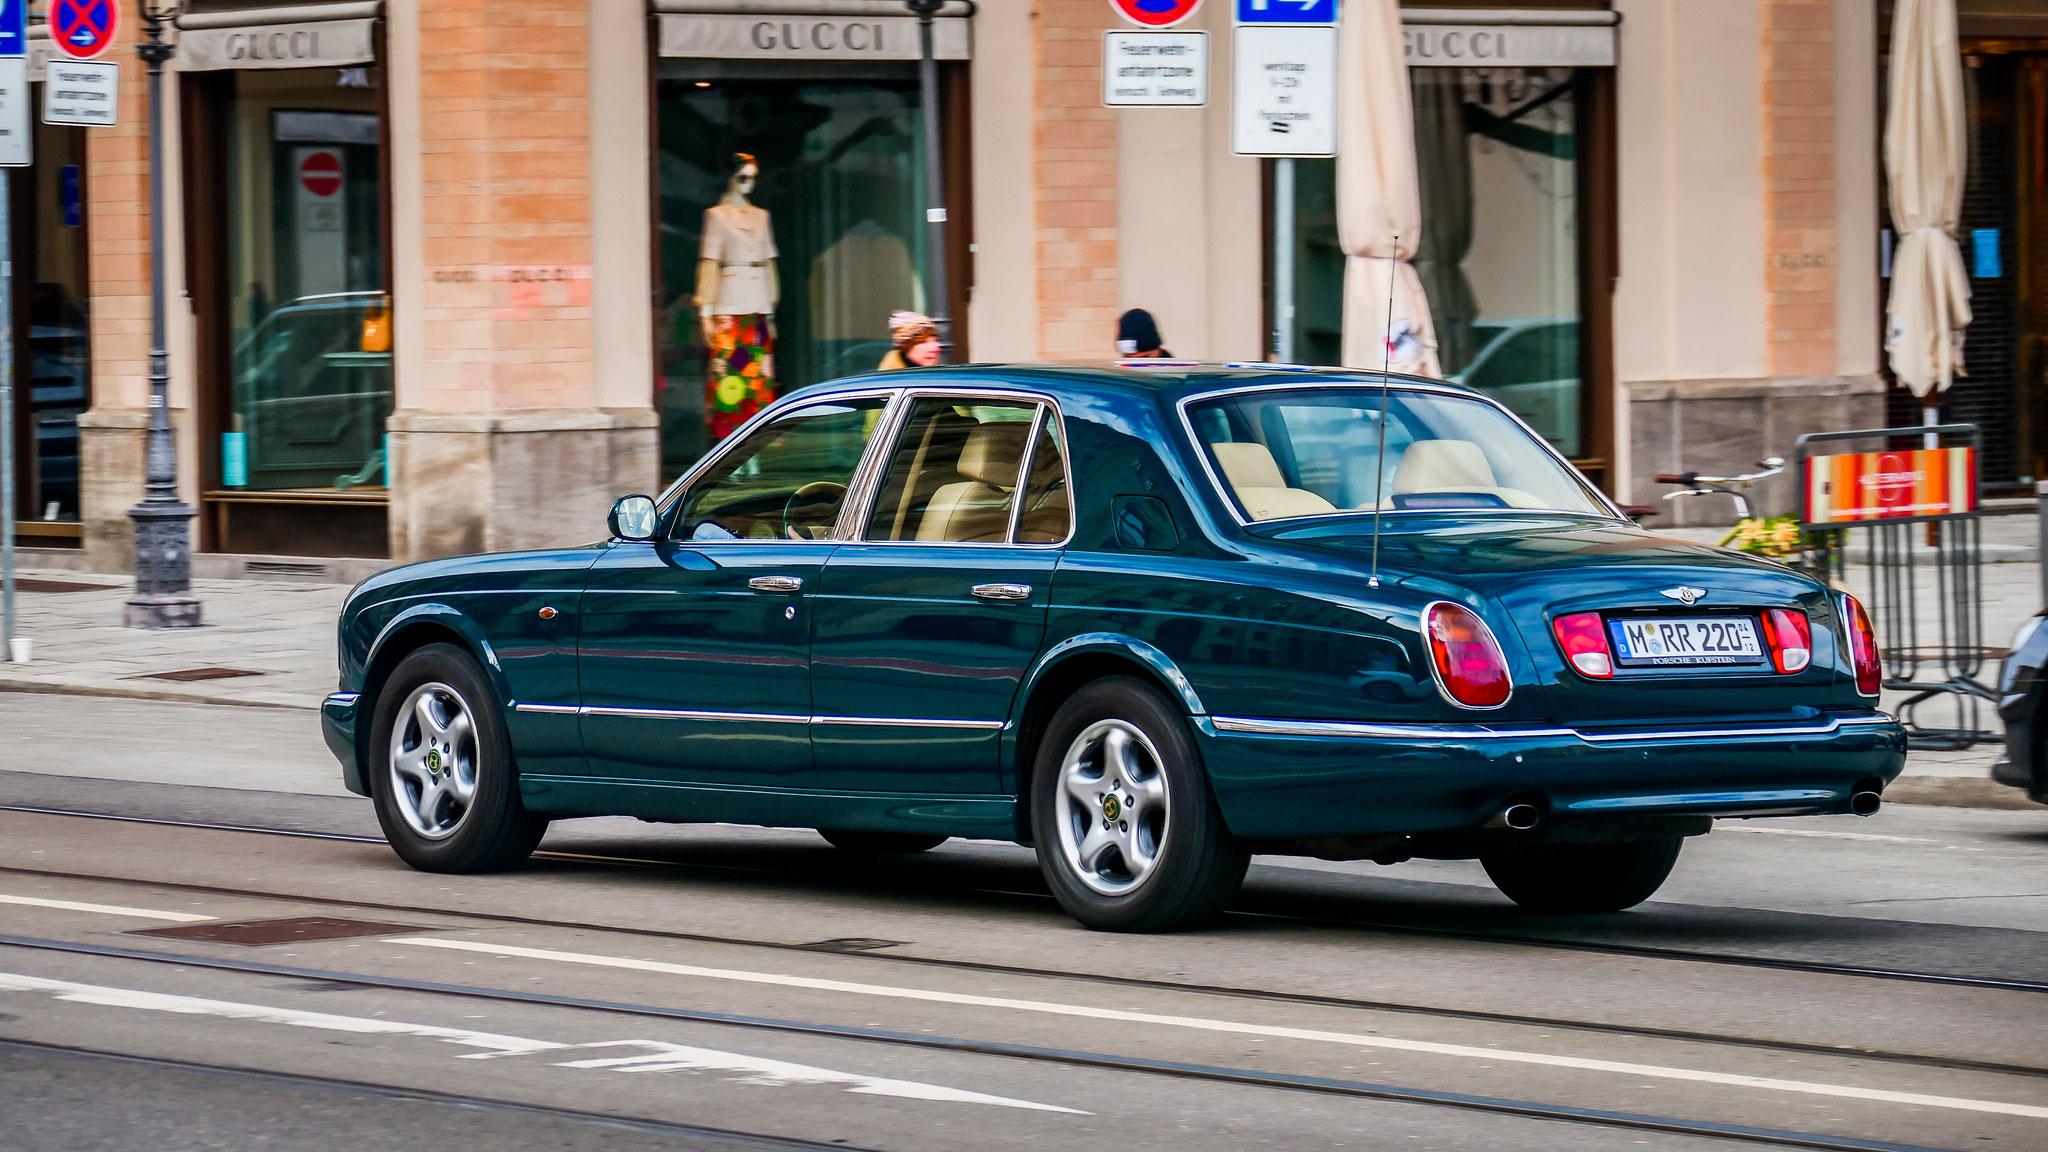 Bentley Arnage - M-RR-220